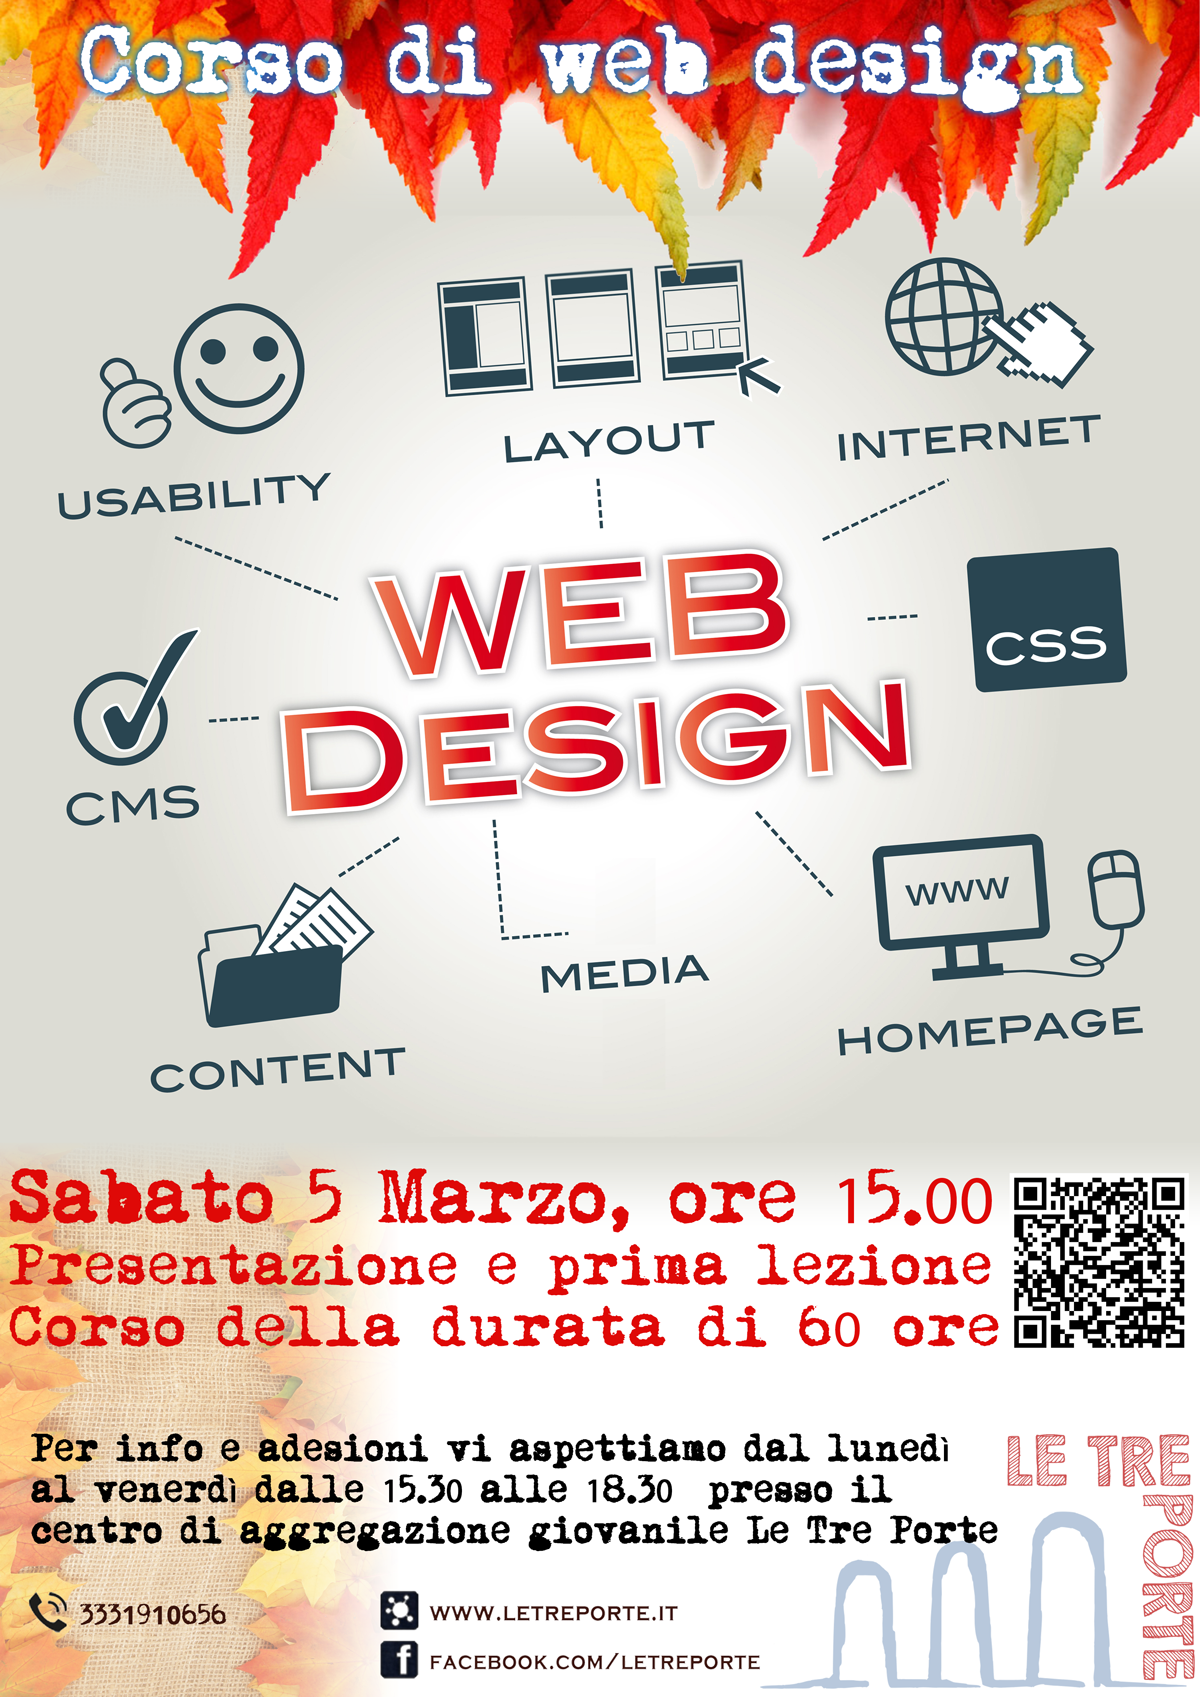 Corso web design – webmaster, appuntamento per Sabato 5 Marzo